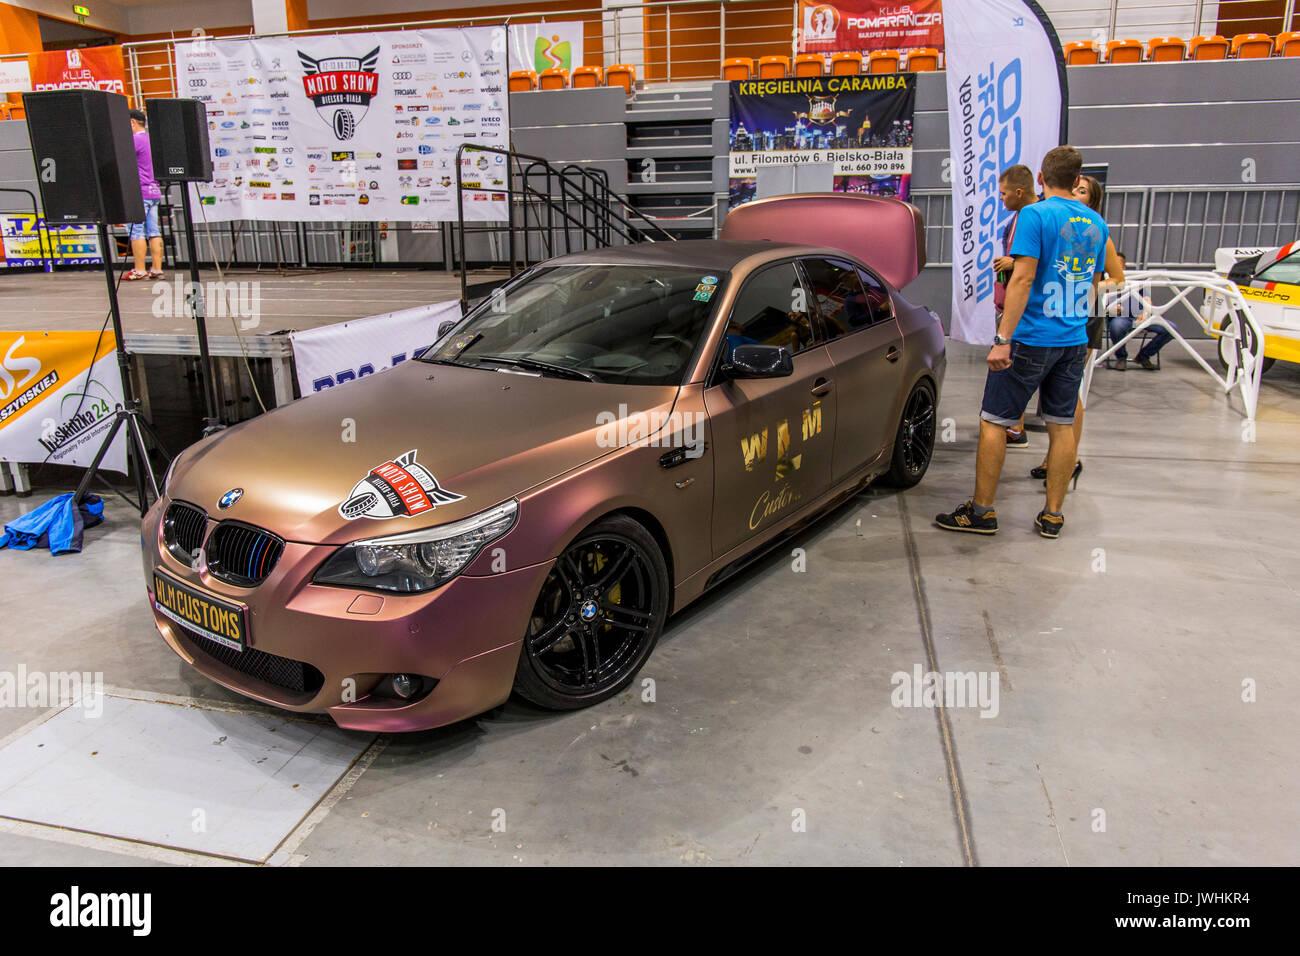 Bielsko-Biala, Poland. 12th Aug, 2017. International automotive trade fairs - MotoShow Bielsko-Biala. BMW E60 parked Stock Photo